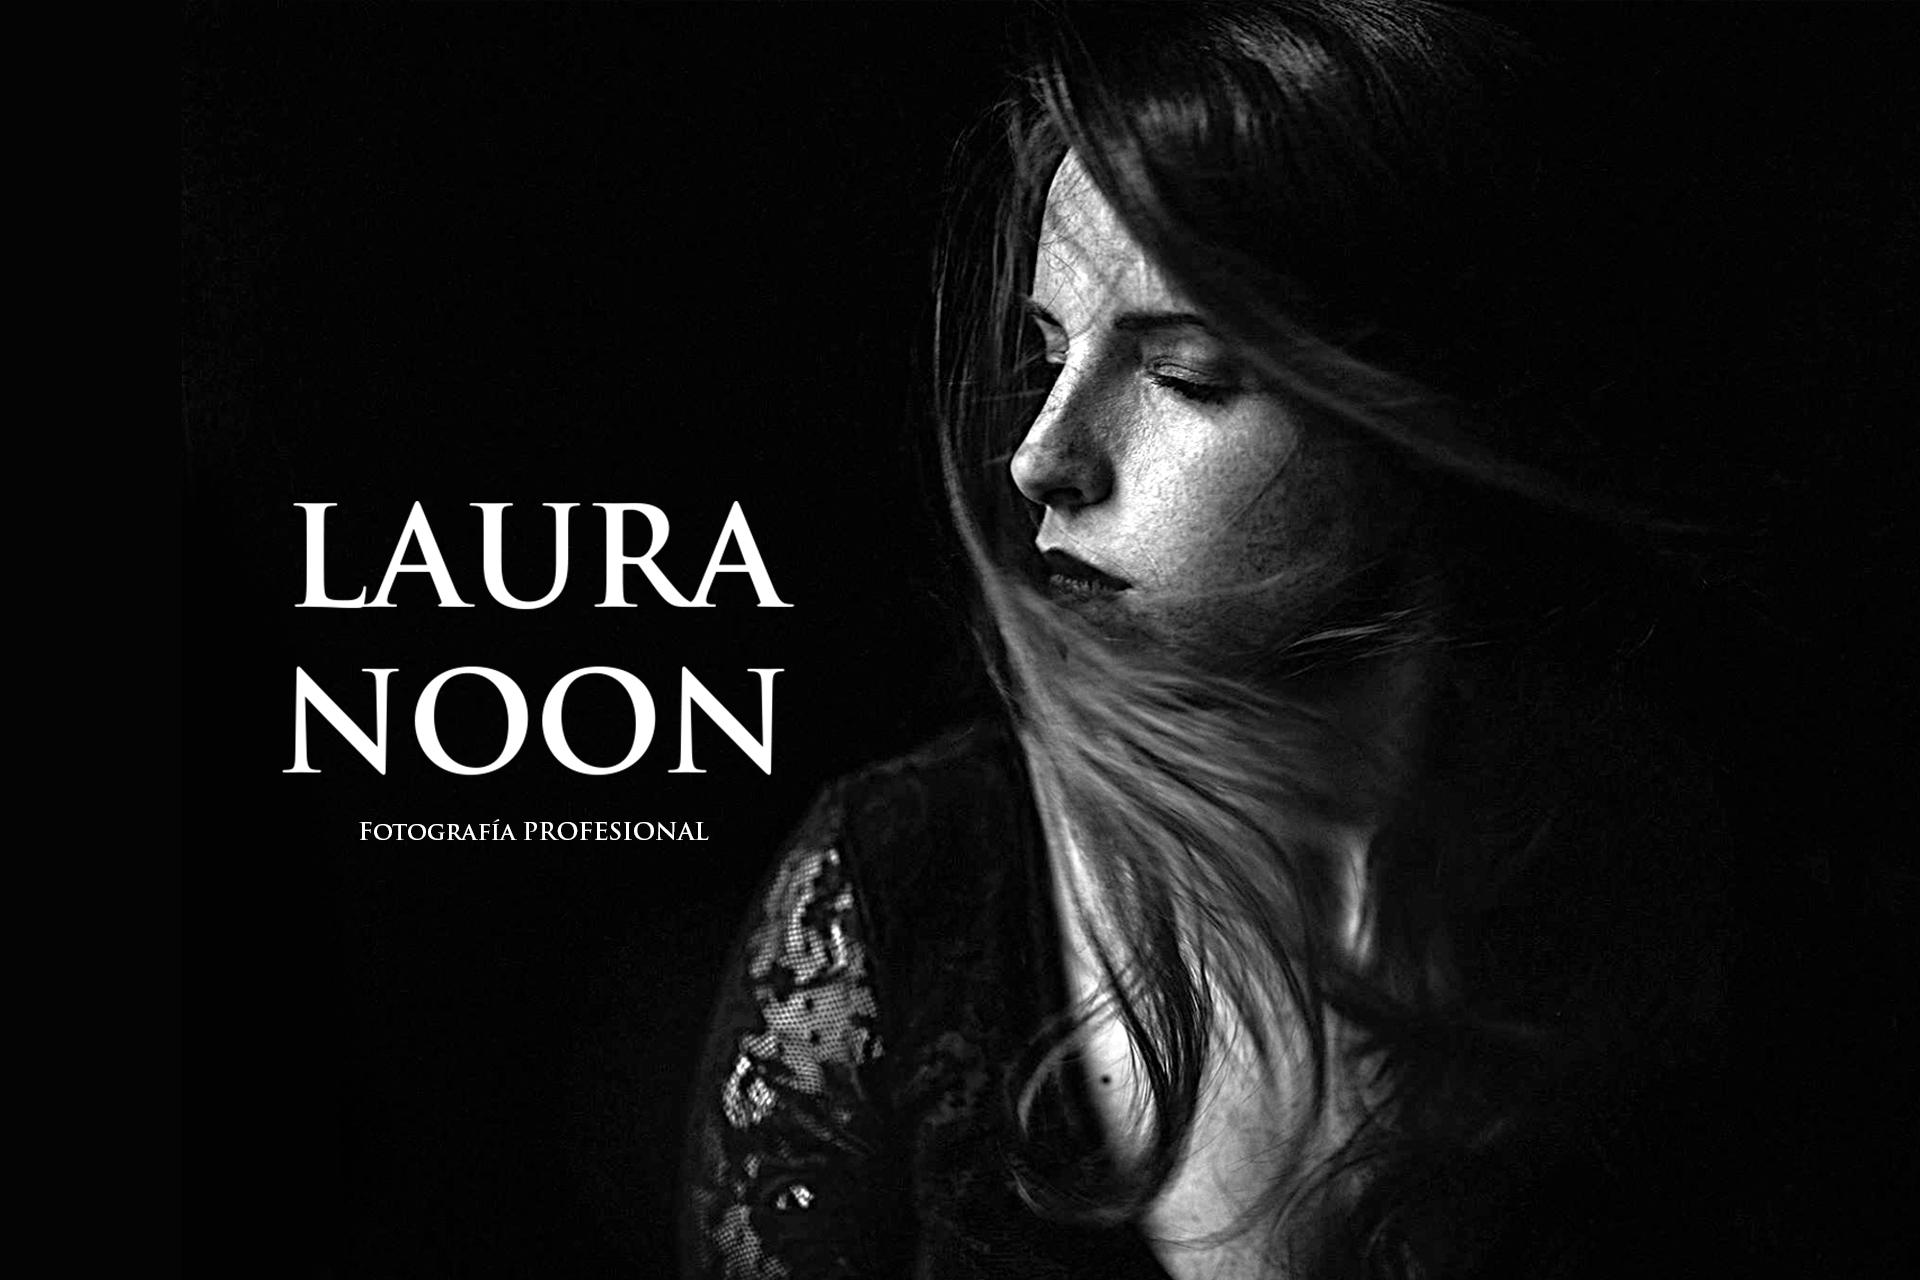 Laura Noon